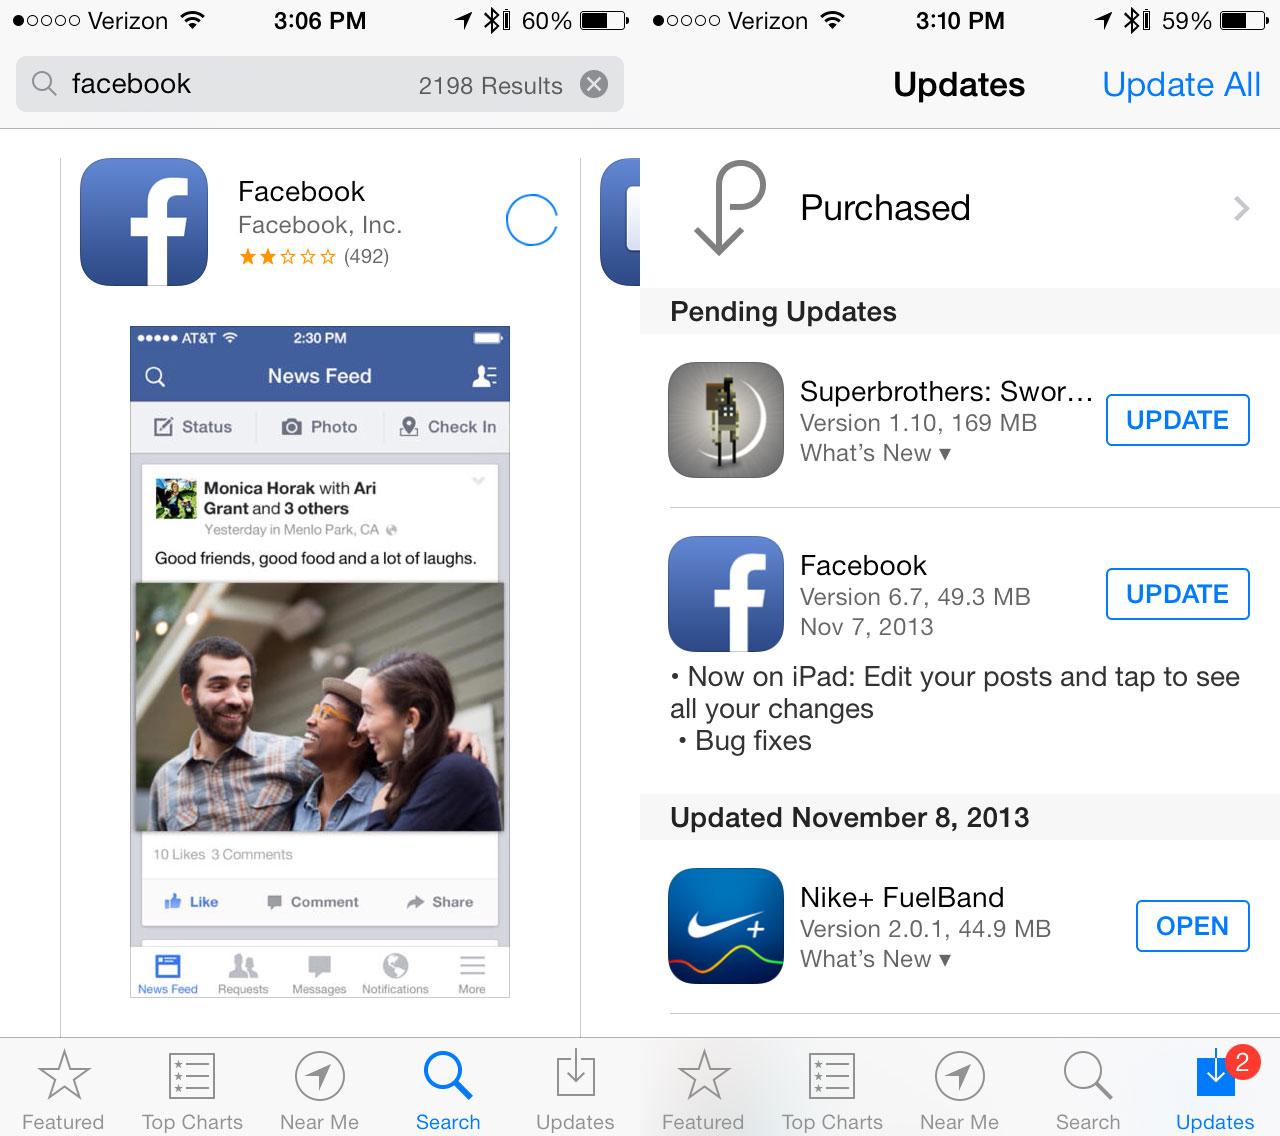 iPhone Facebook App Crashing After Update, Quick Fix